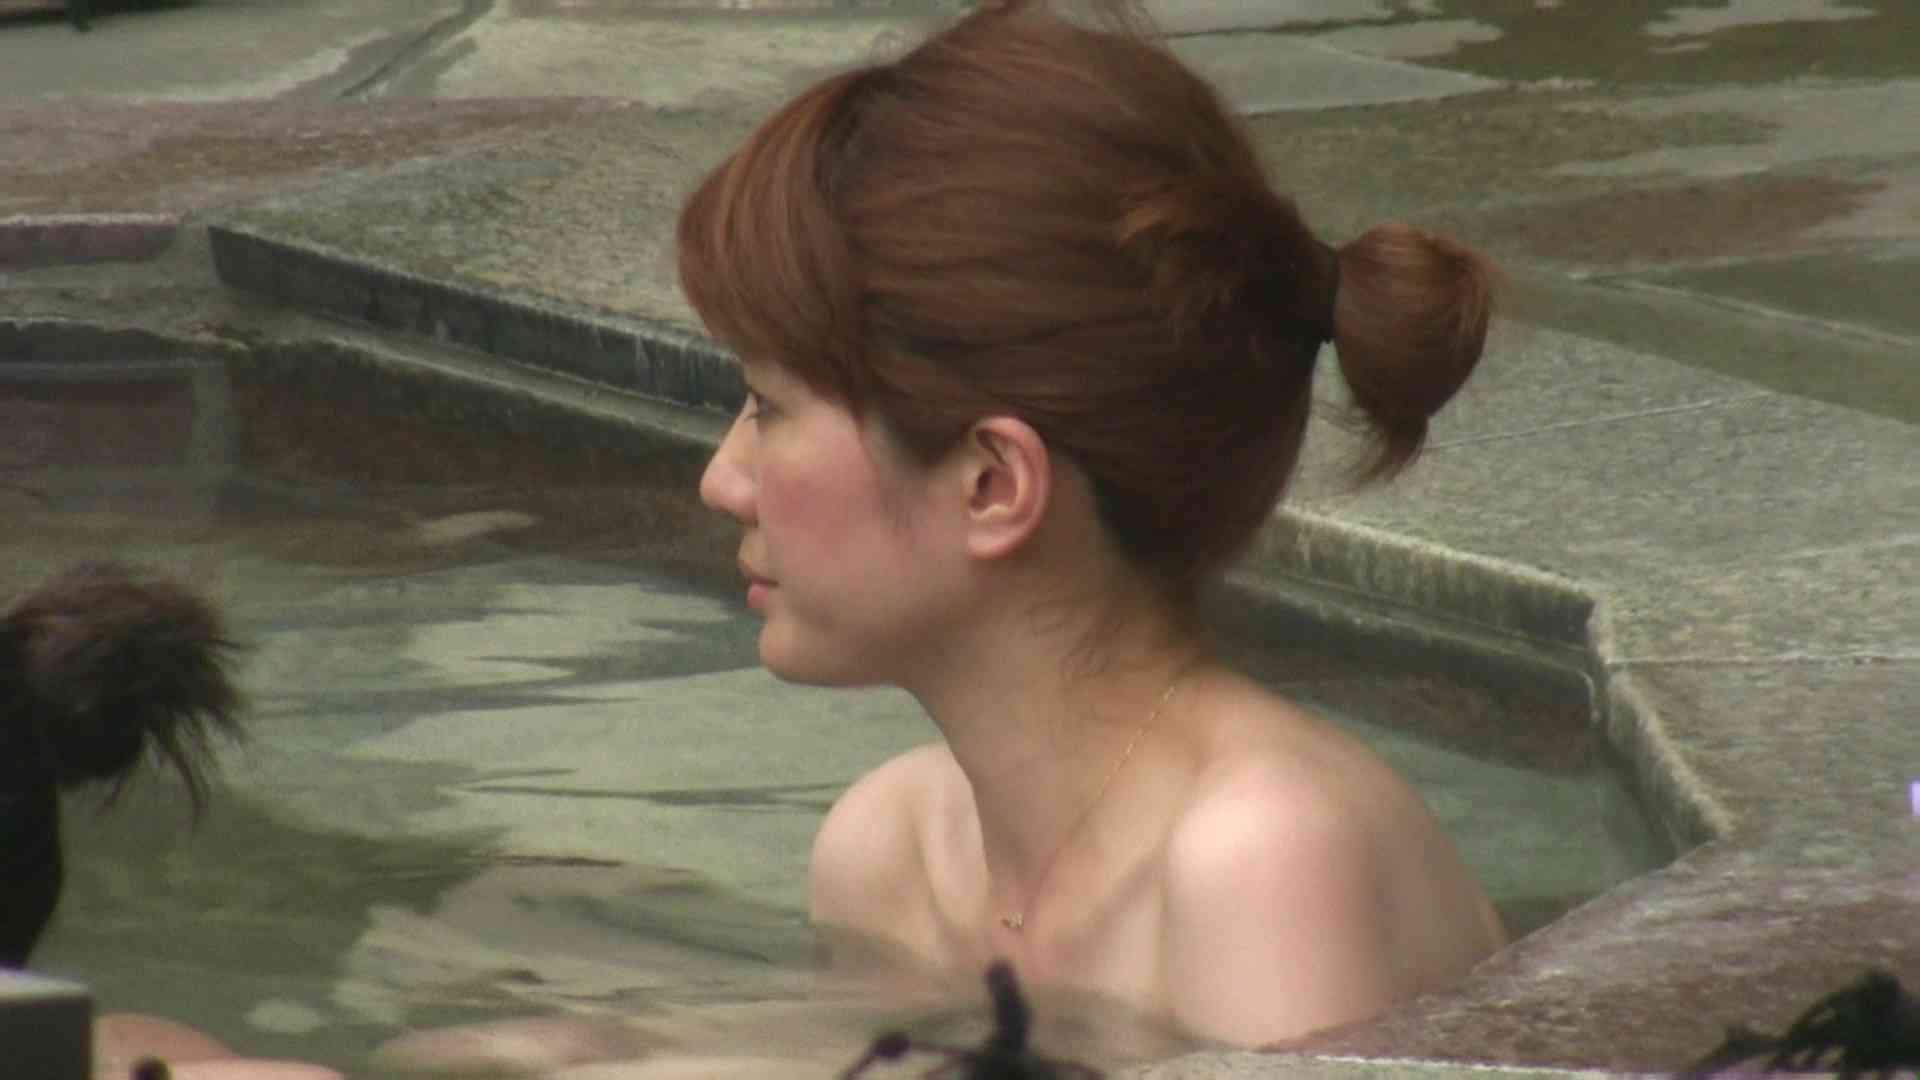 Aquaな露天風呂Vol.110 盗撮映像  46Pix 36